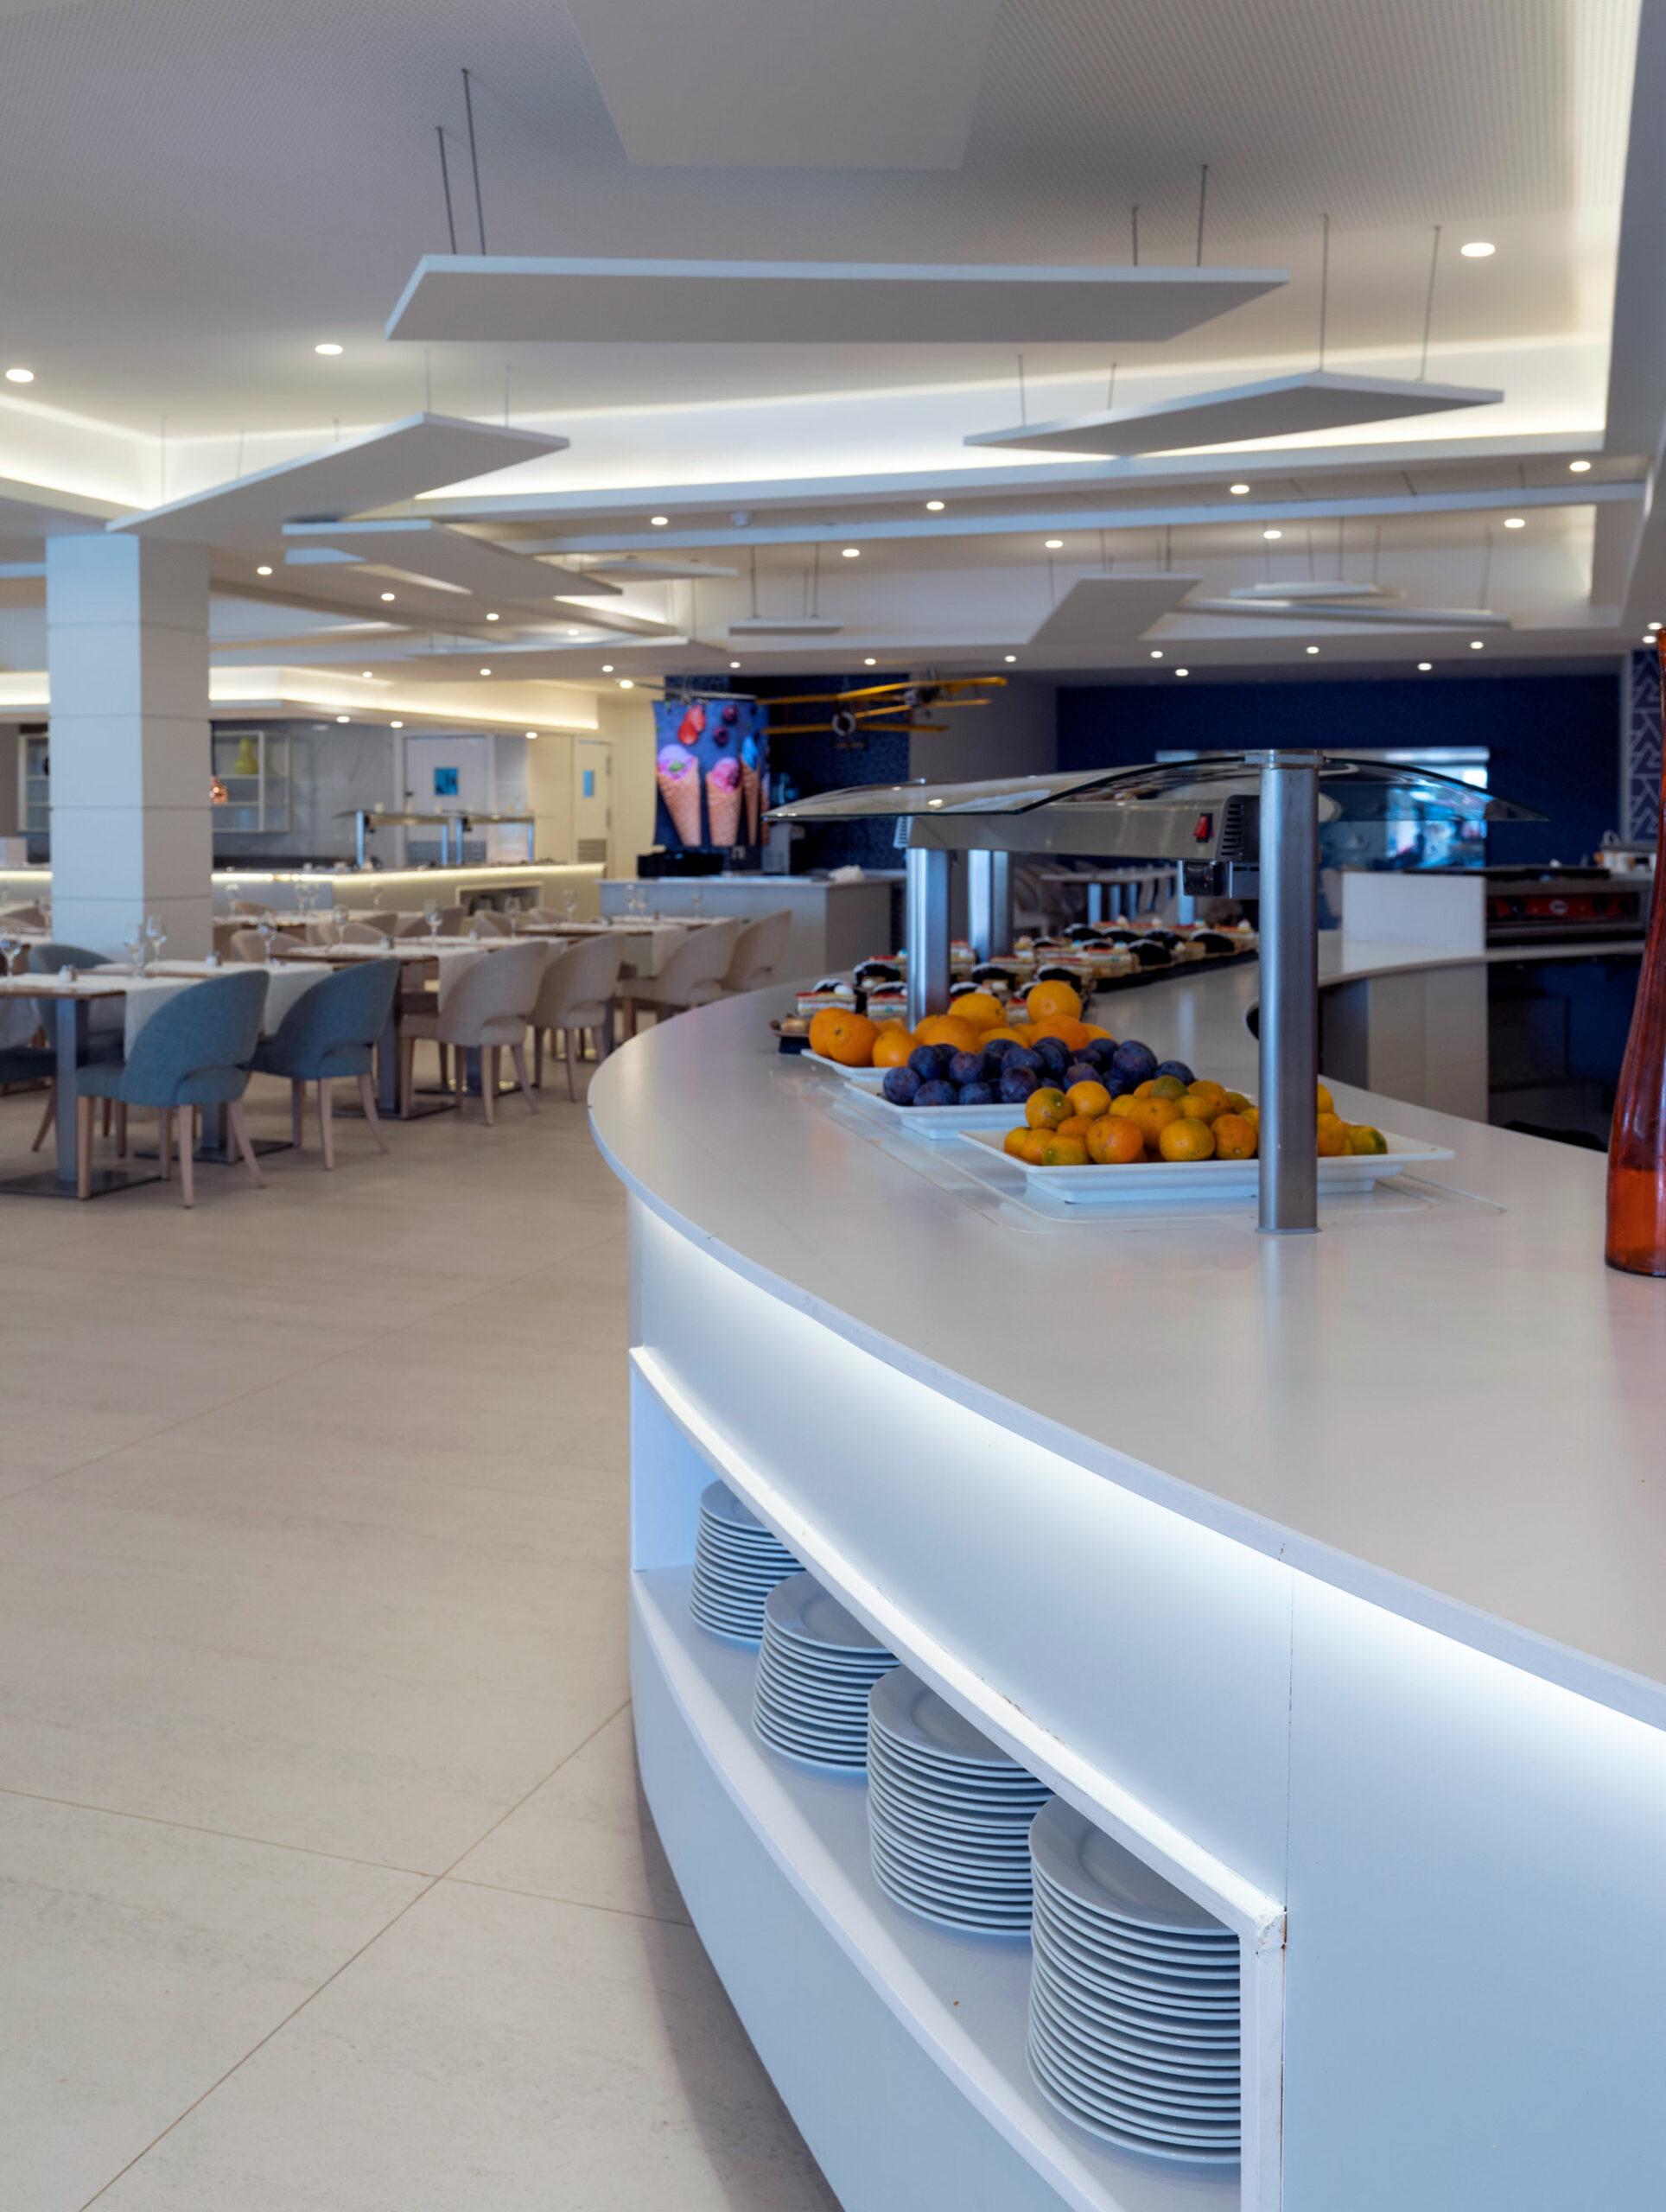 Hotel Mediterráneo  - Hotel Mediterraneo Park 9 Dekton Silestone Piedra Natural Cosentino scaled 61